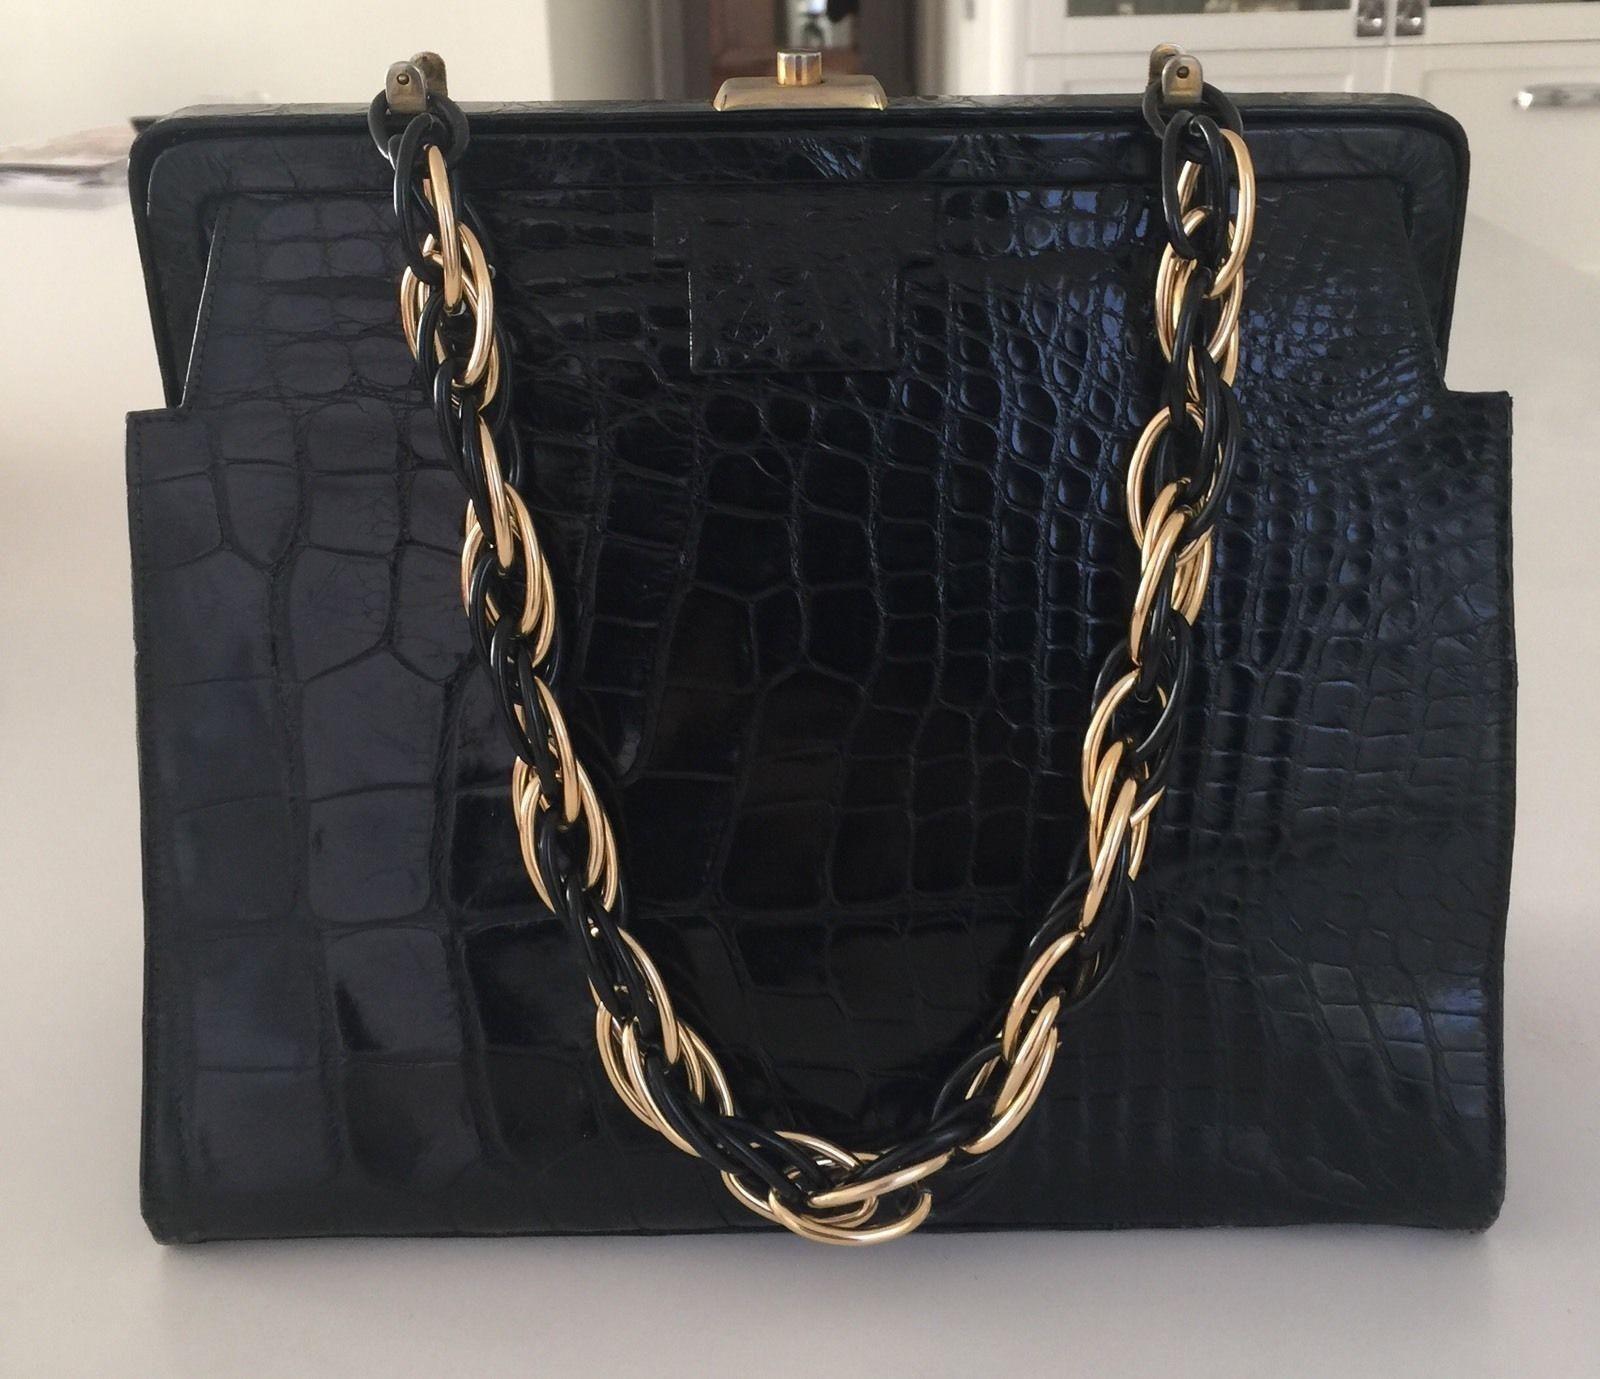 5ec4ef202285 Save 89% on the Saks Fifth Avenue Alligator Handbag Black Satchel! This  satchel is a top 10 member favorite on Tradesy.